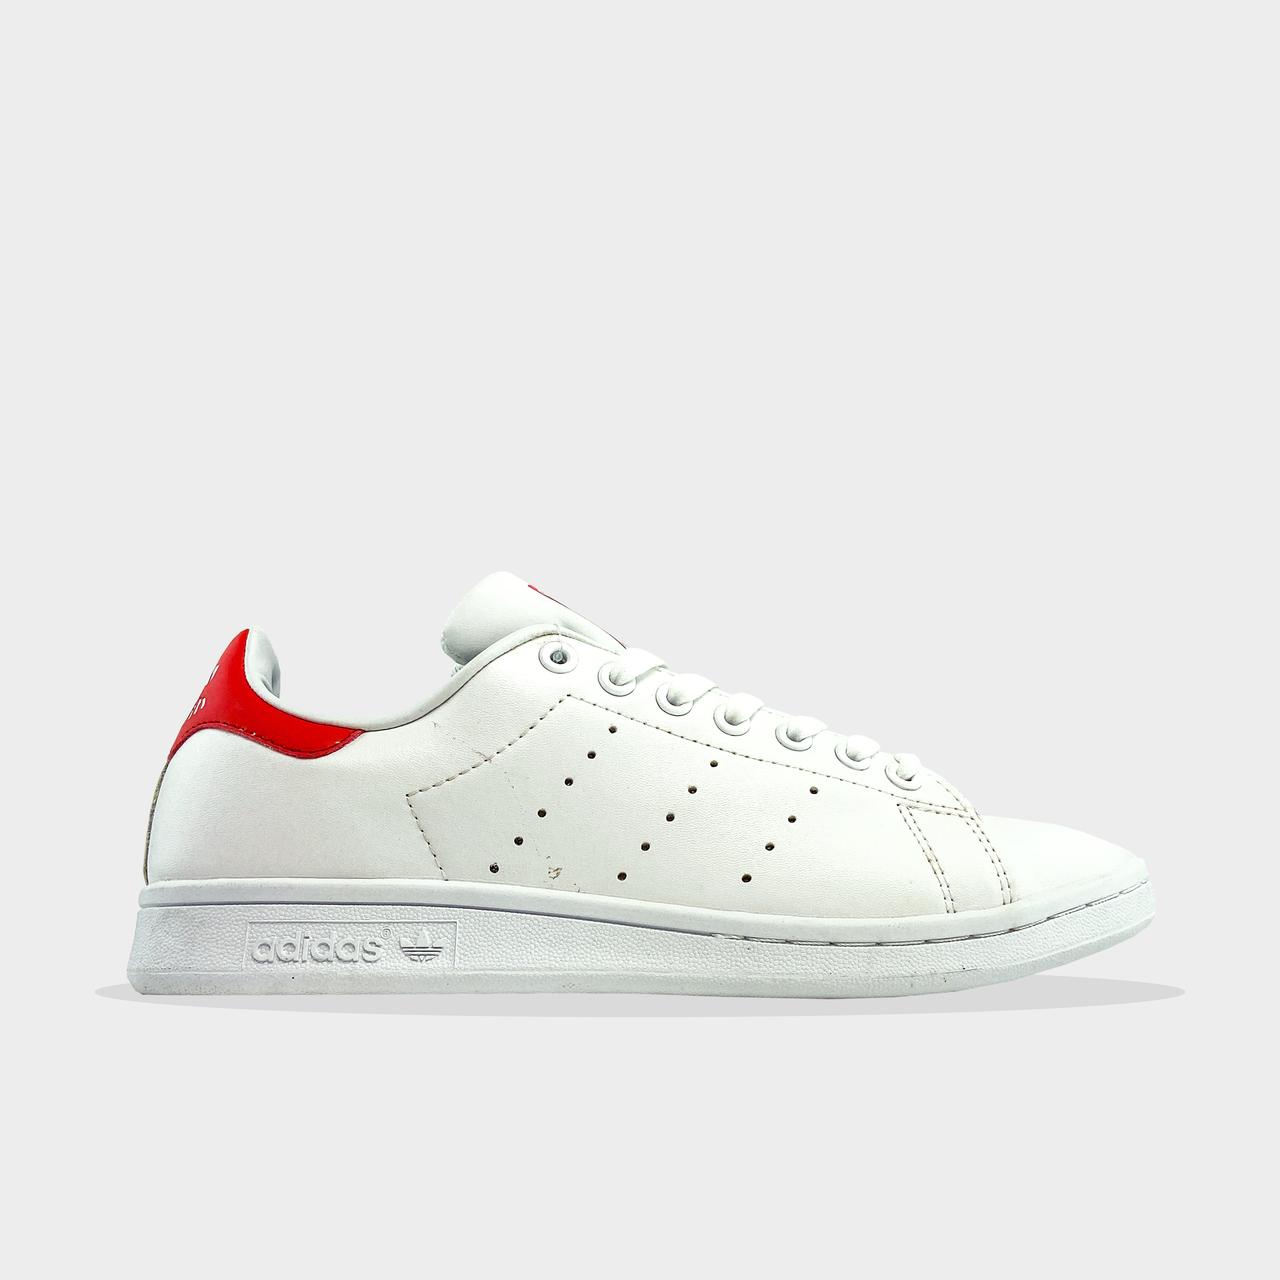 Ad!id@s, крос, обувь, взуття, sneakers, шузы, Stan Smith White Red (Белый)